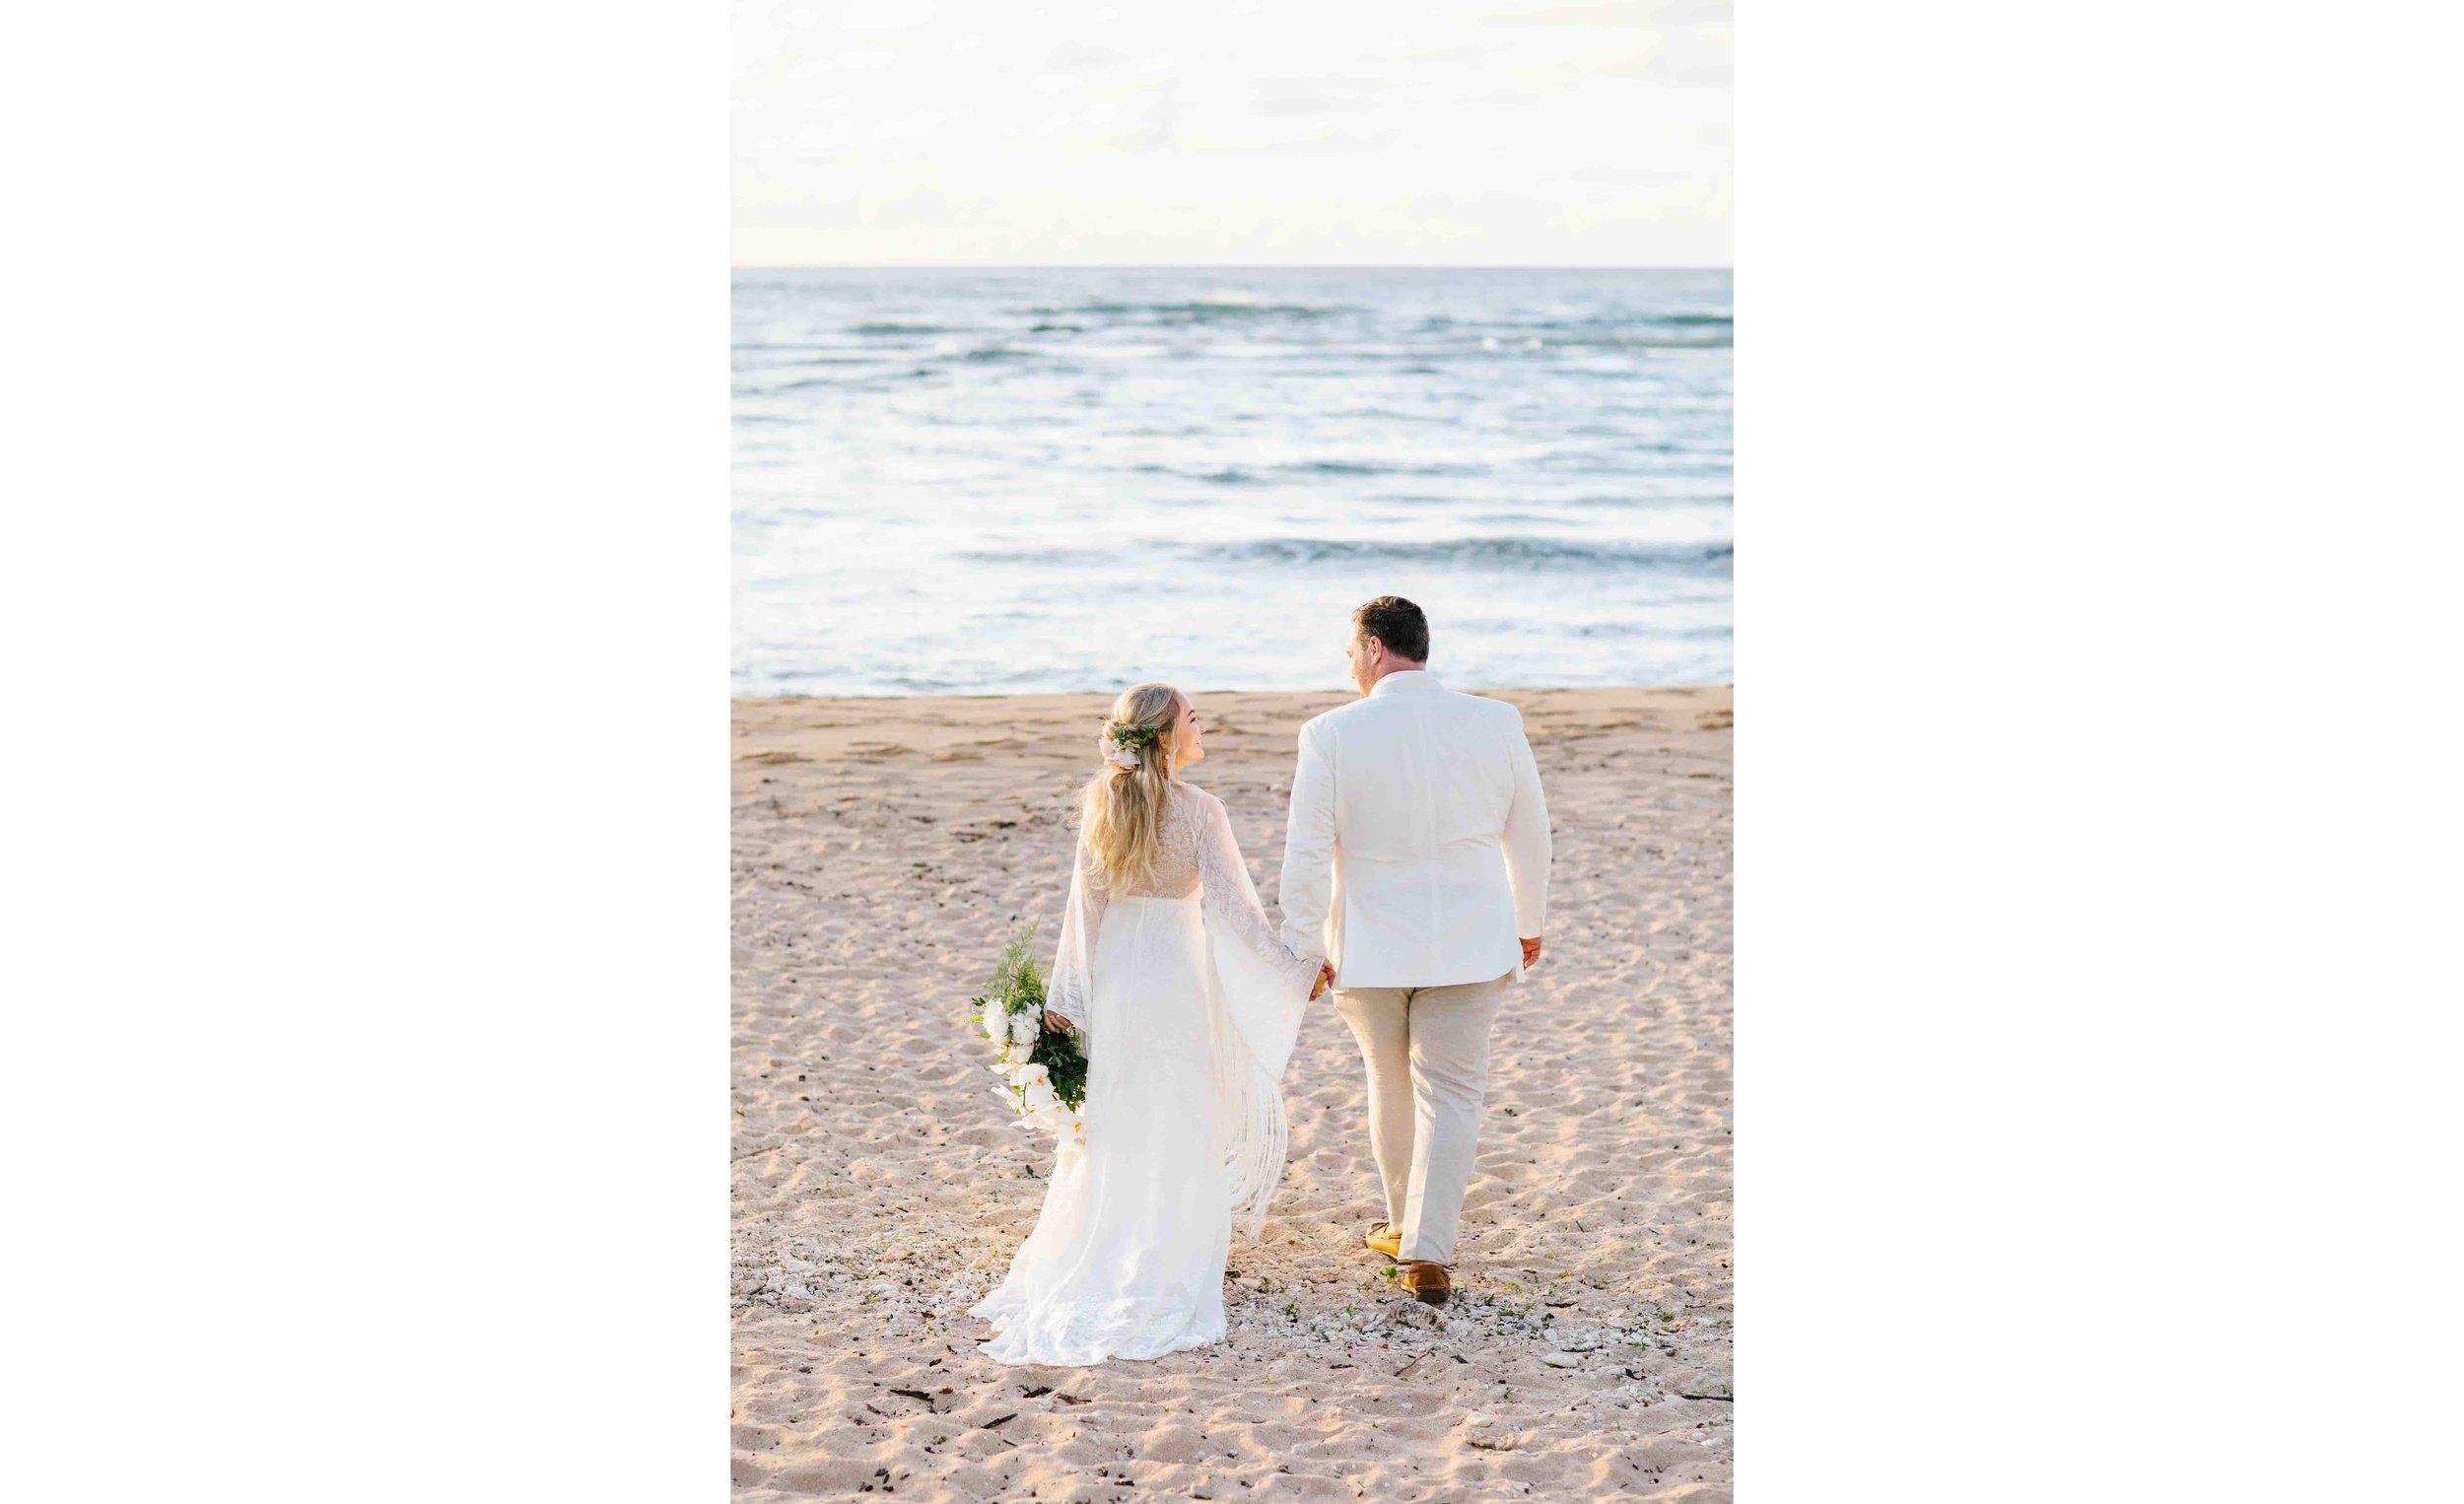 Hawaii Beach Wedding Photography at Loulu Palm